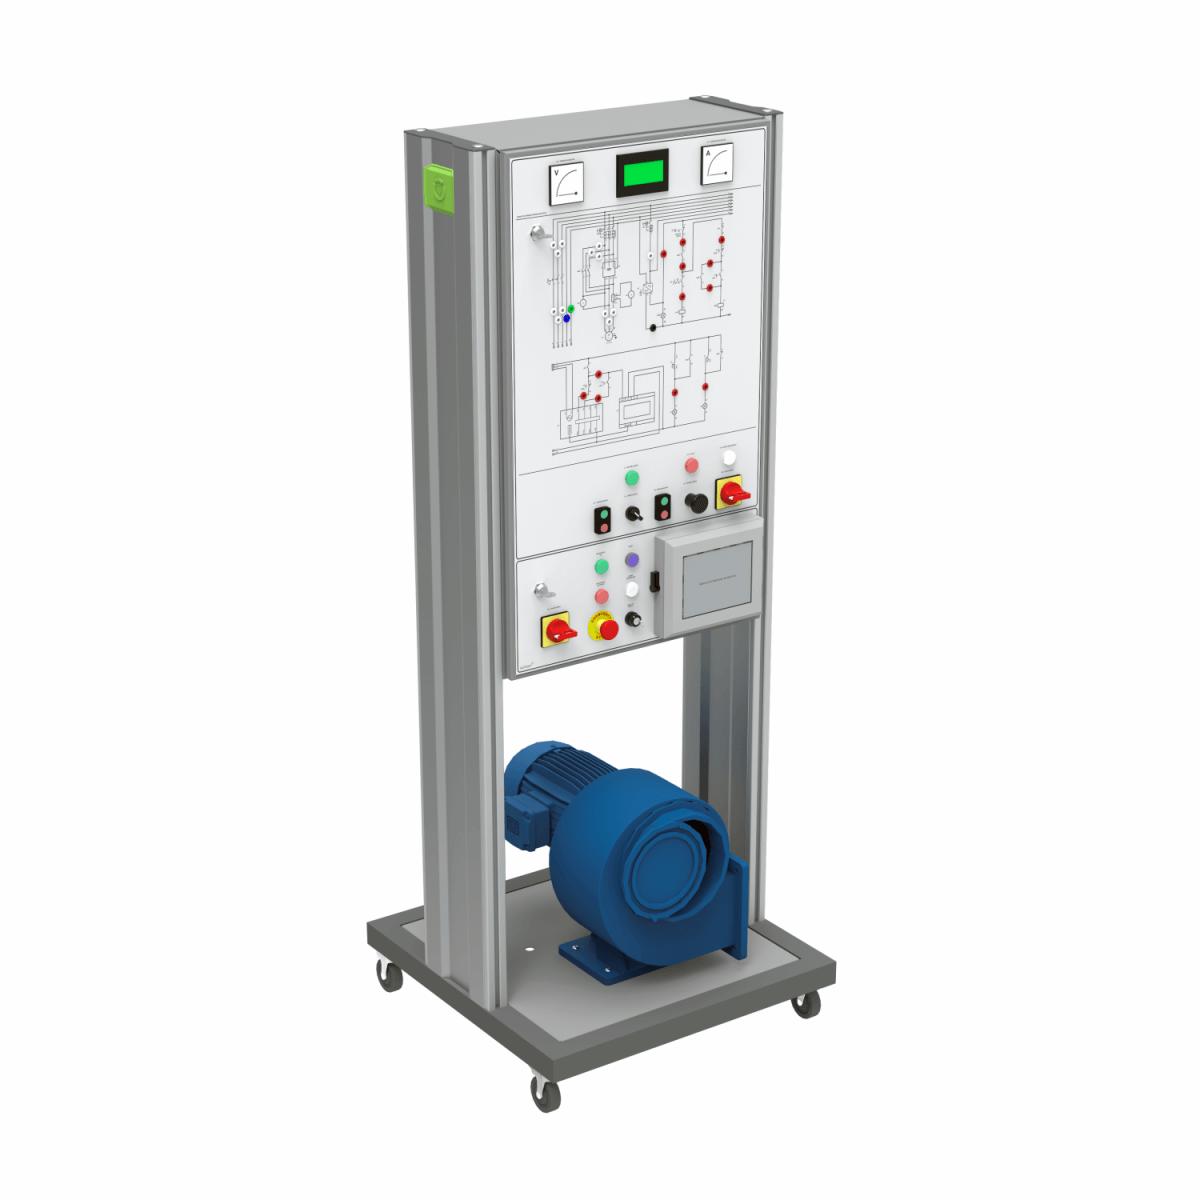 lab-eletricidade-industrial-bancada-didatica-partida-estatica-auttom-4